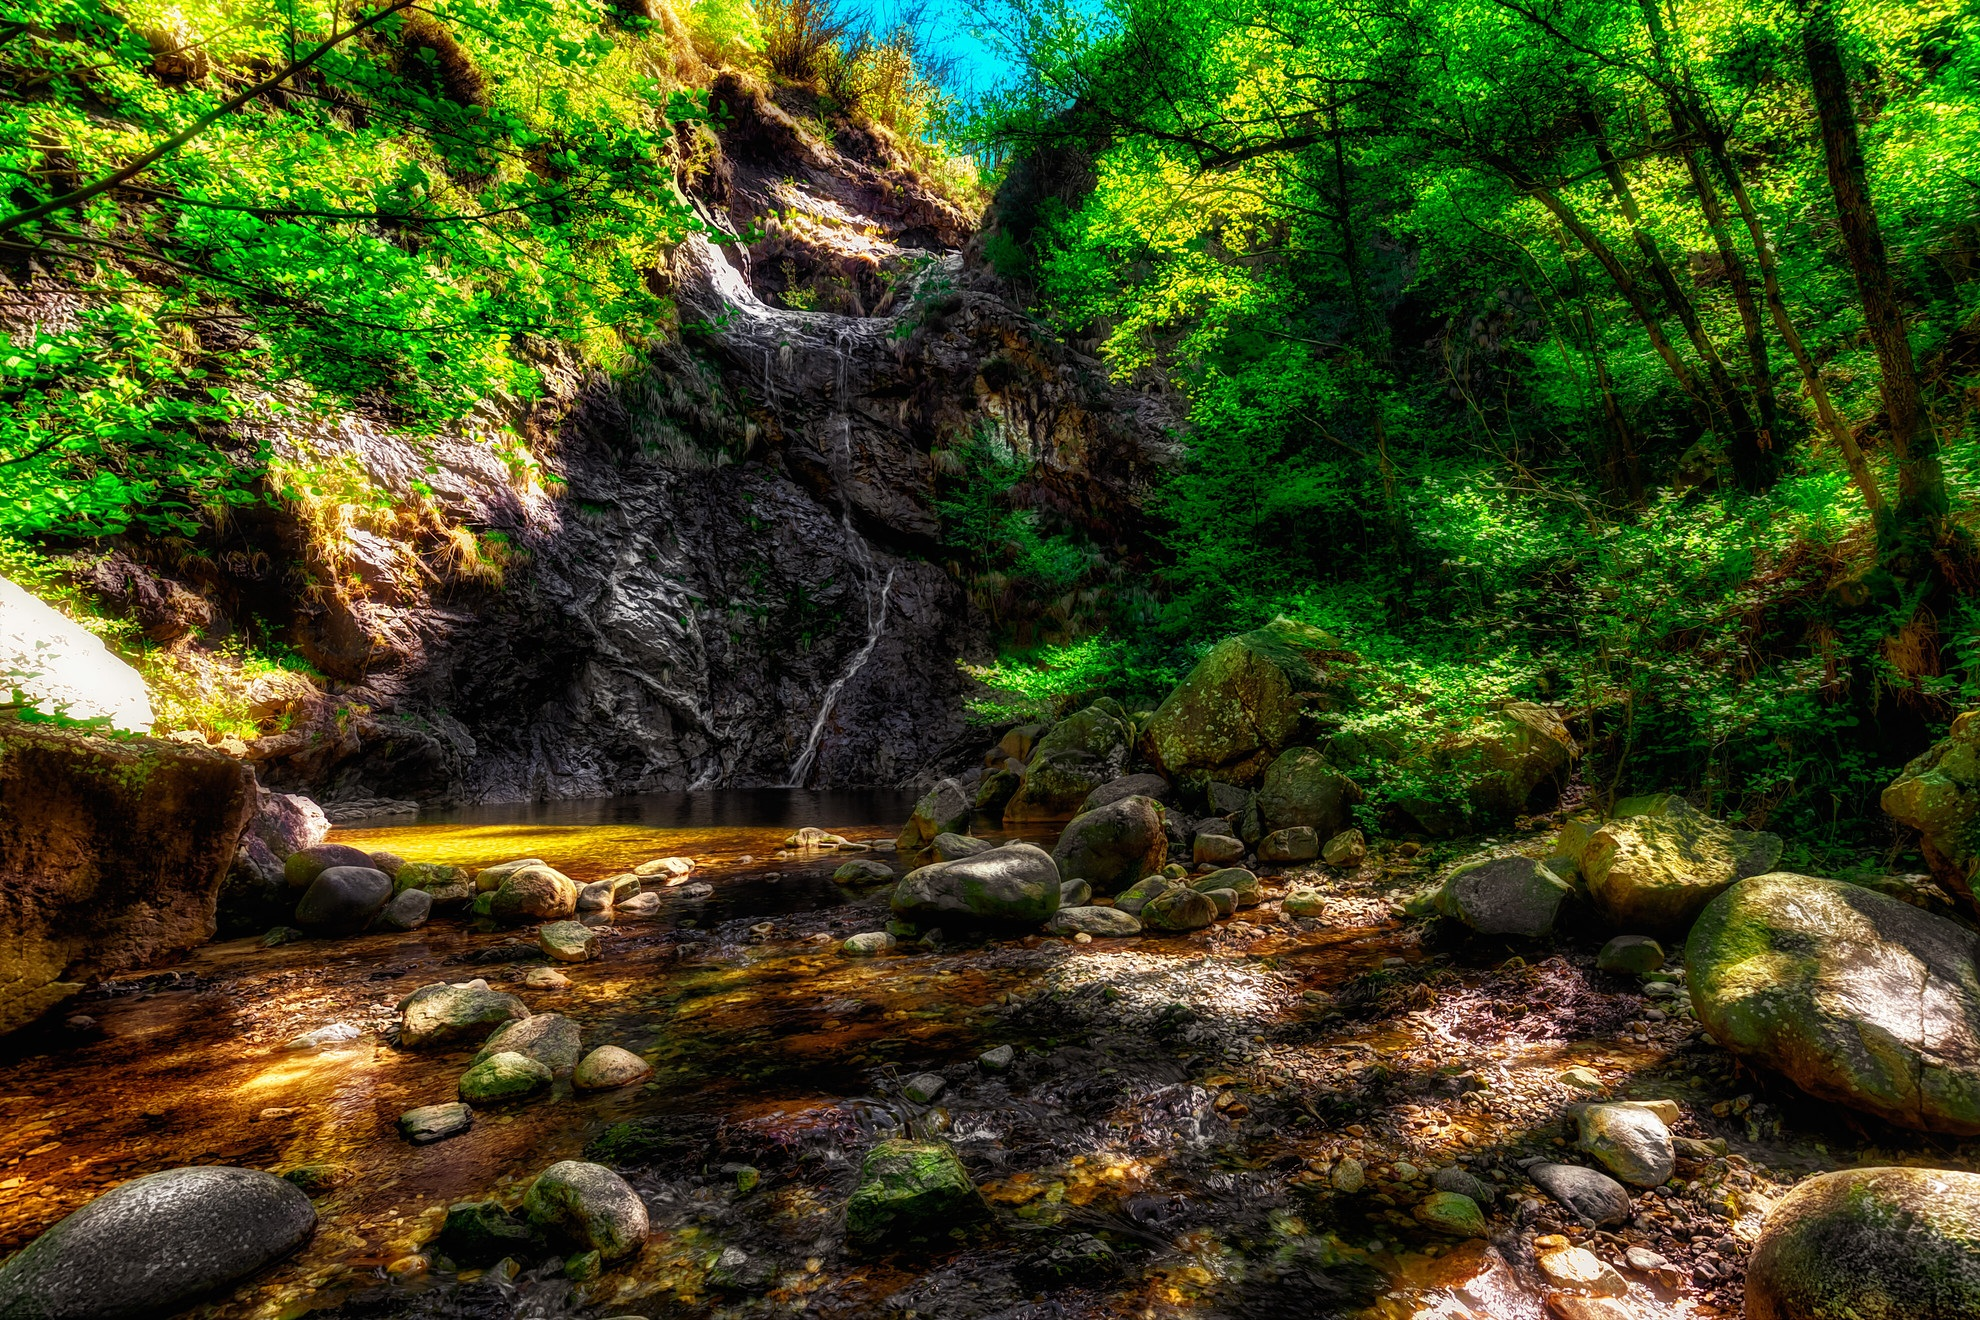 Waterfall on Pescone, Piemonte, Italia